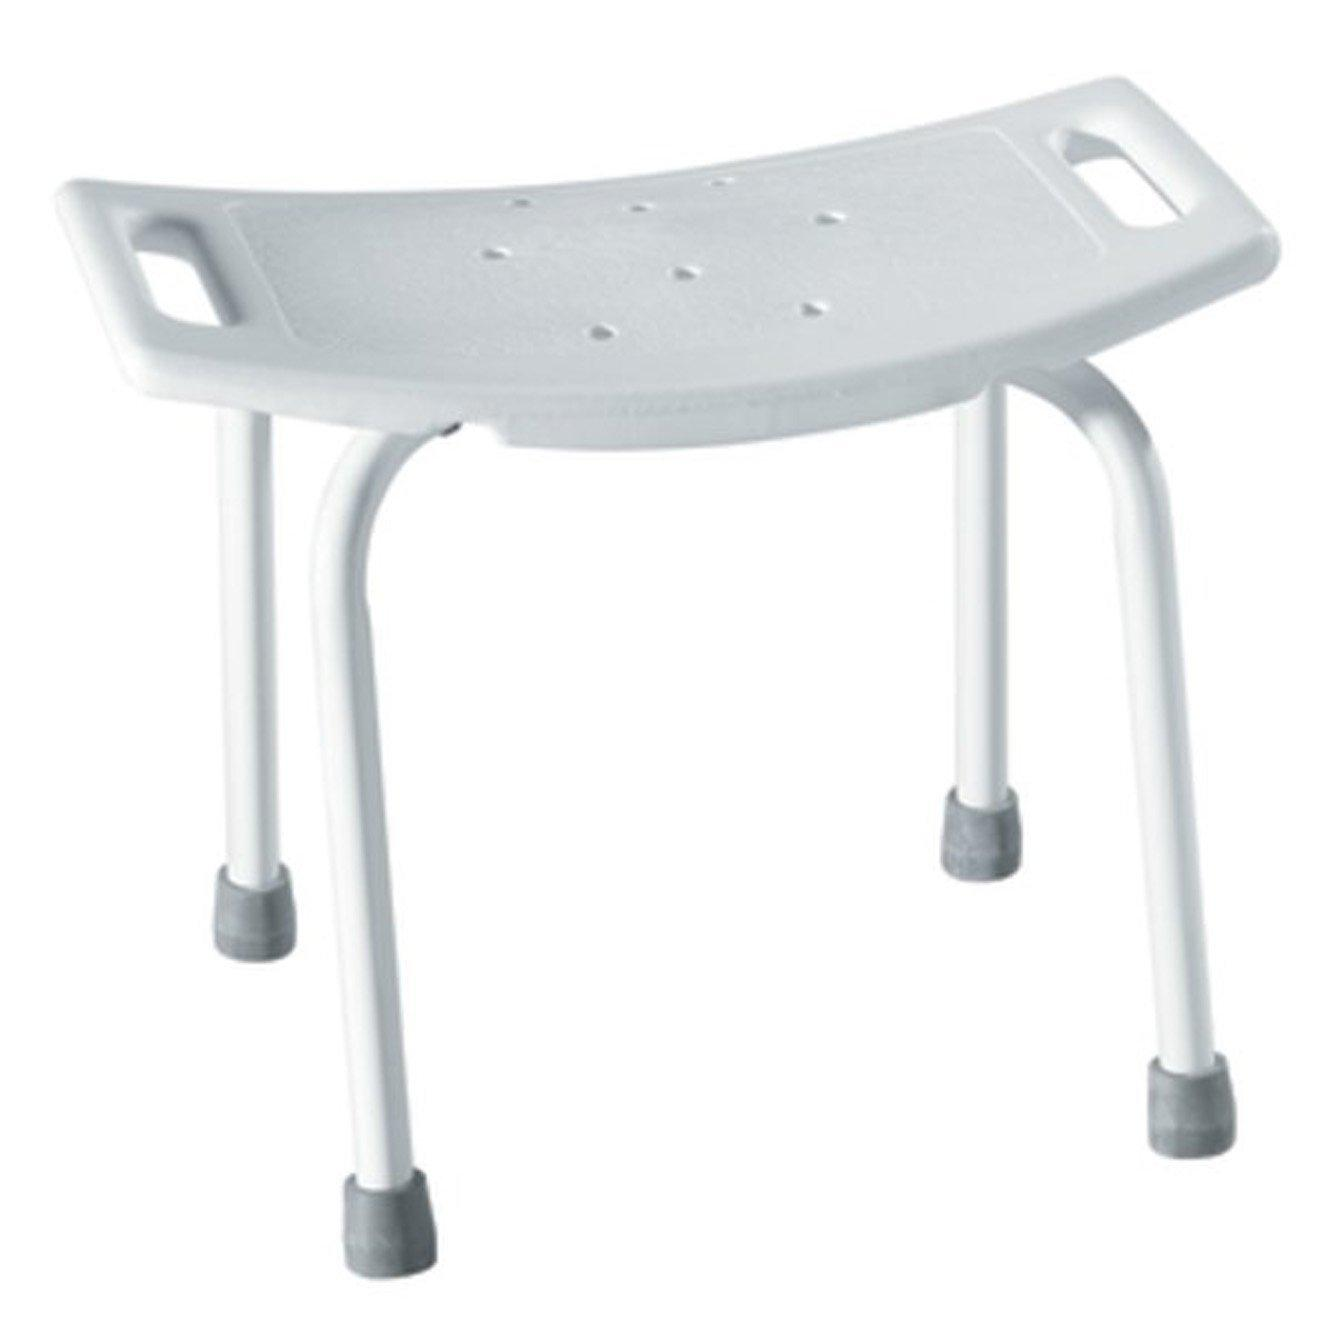 Amazon.com: Moen DN7035 Shower Seat, Glacier: Home Improvement